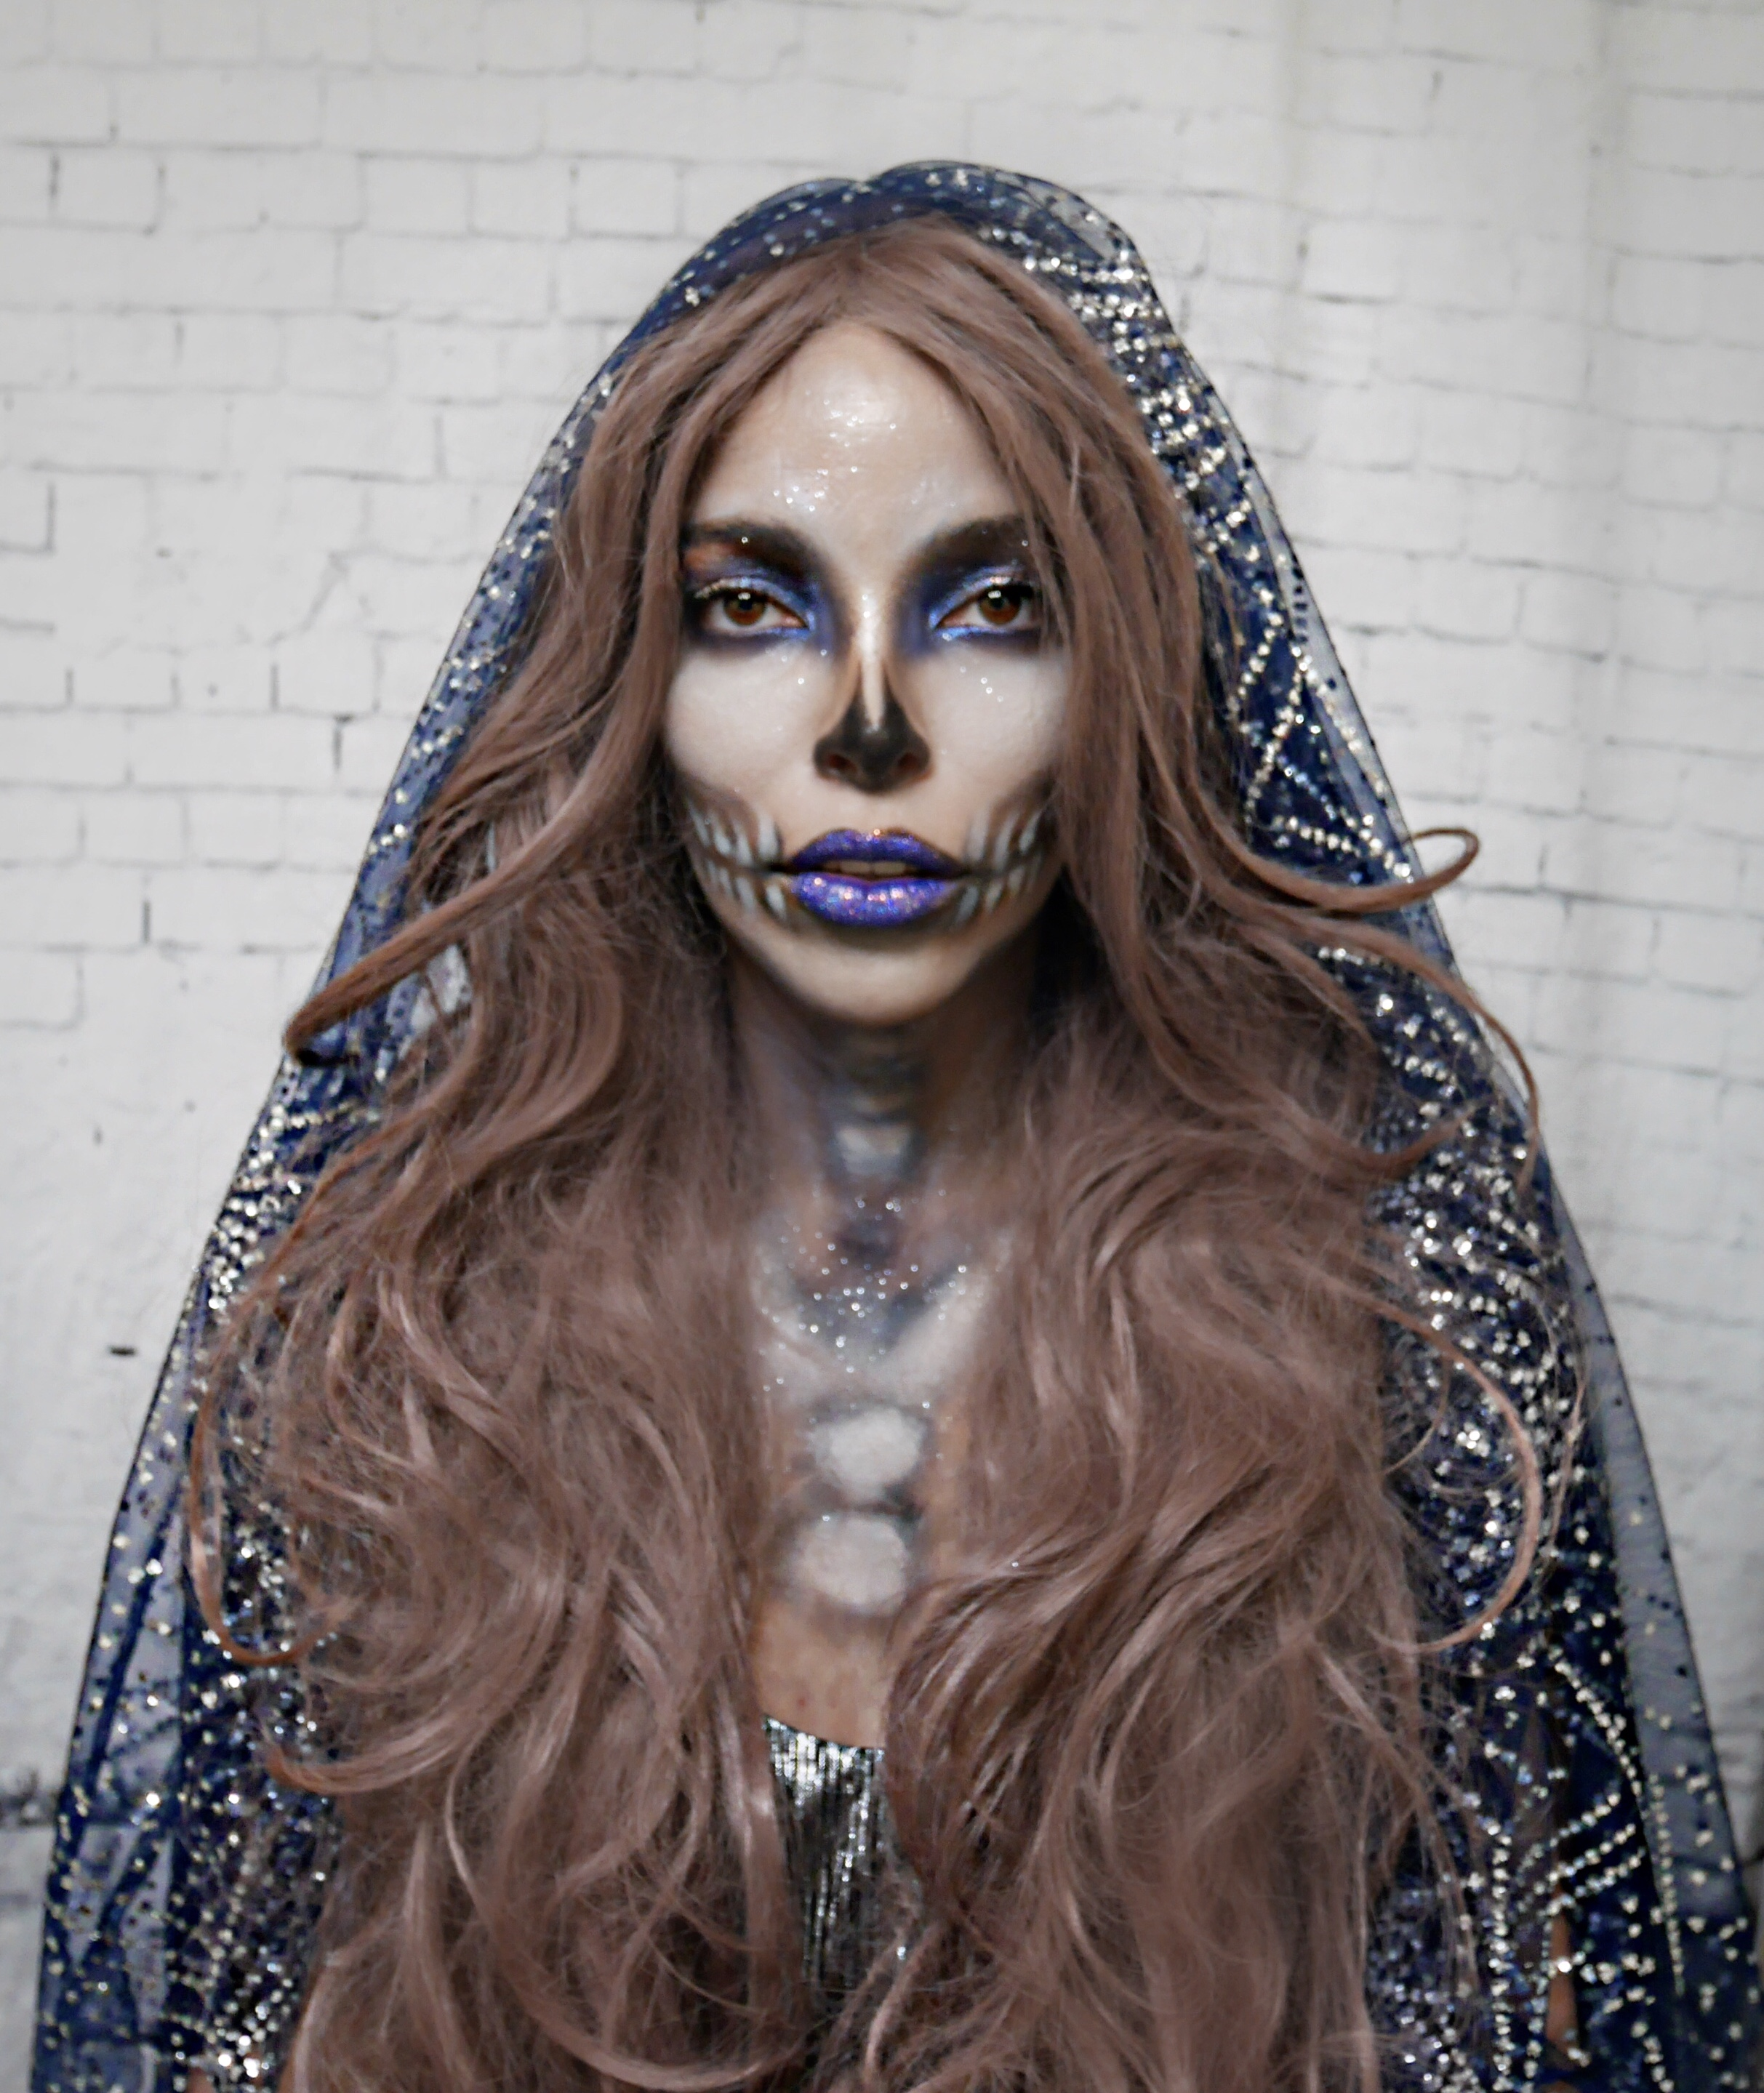 skeleton-bride-glittery-girl-halloween-makeup-costume-veil-fabric